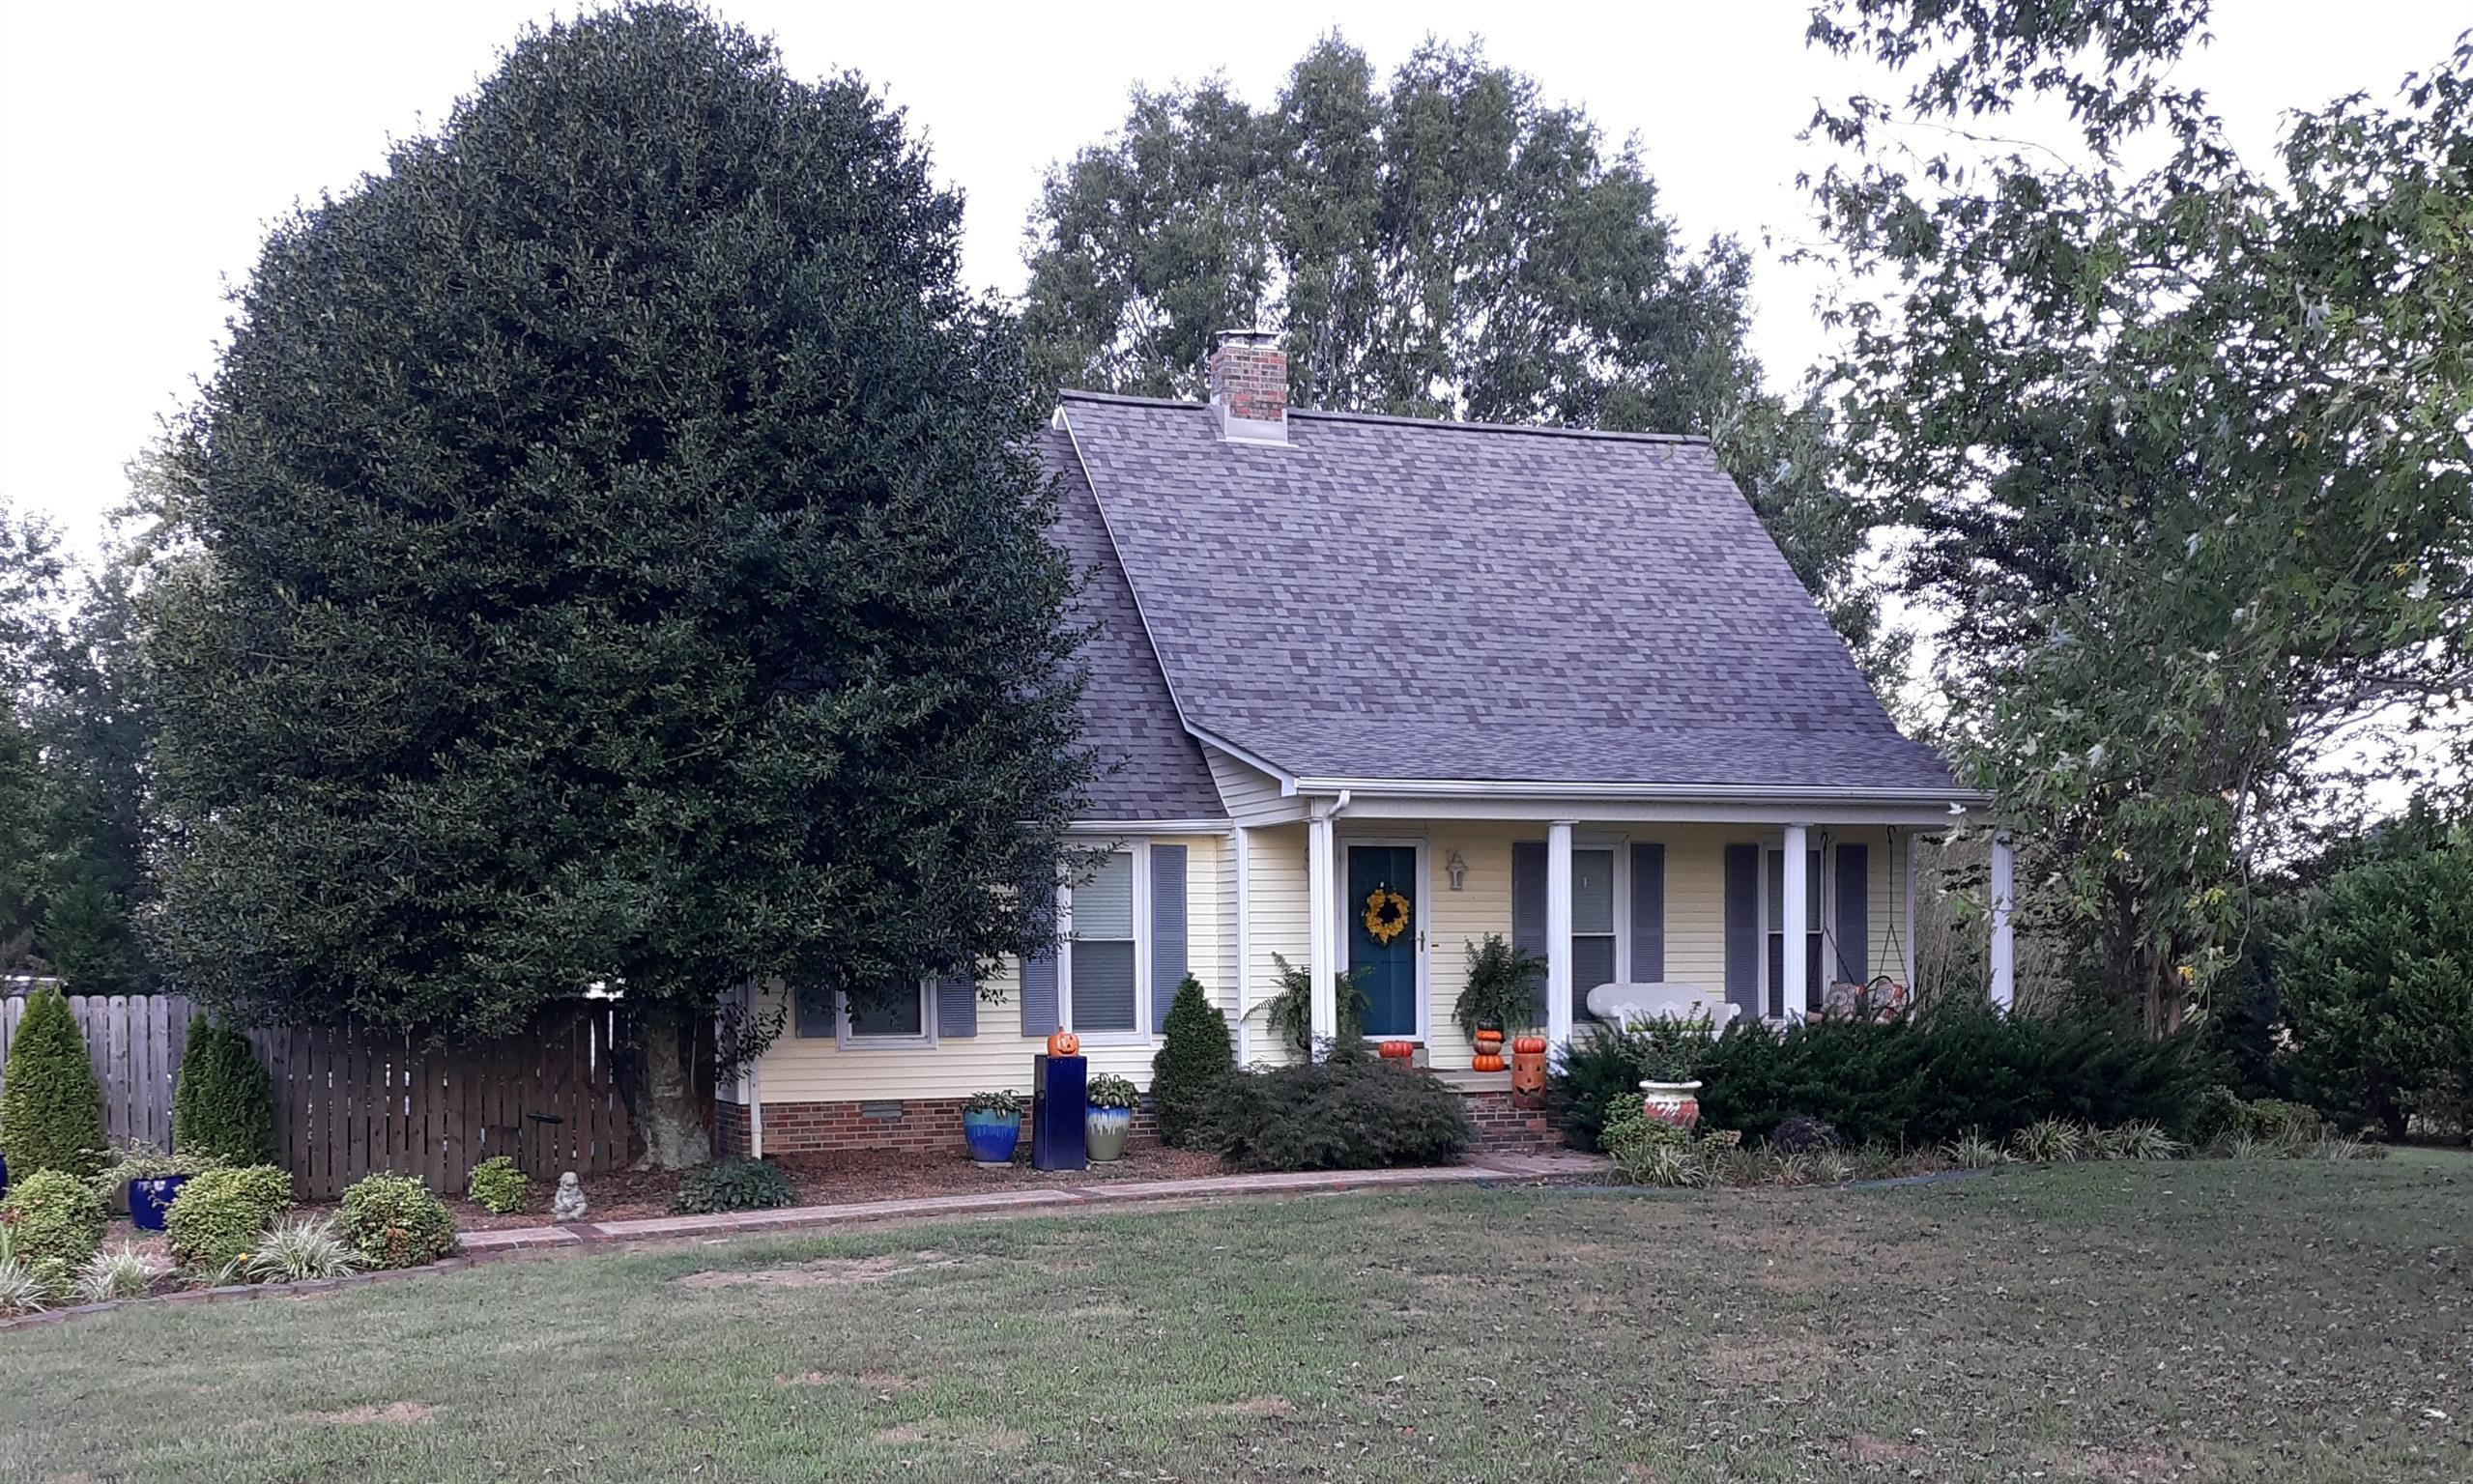 902 Prosser Rd, Leoma, TN 38468 - Leoma, TN real estate listing